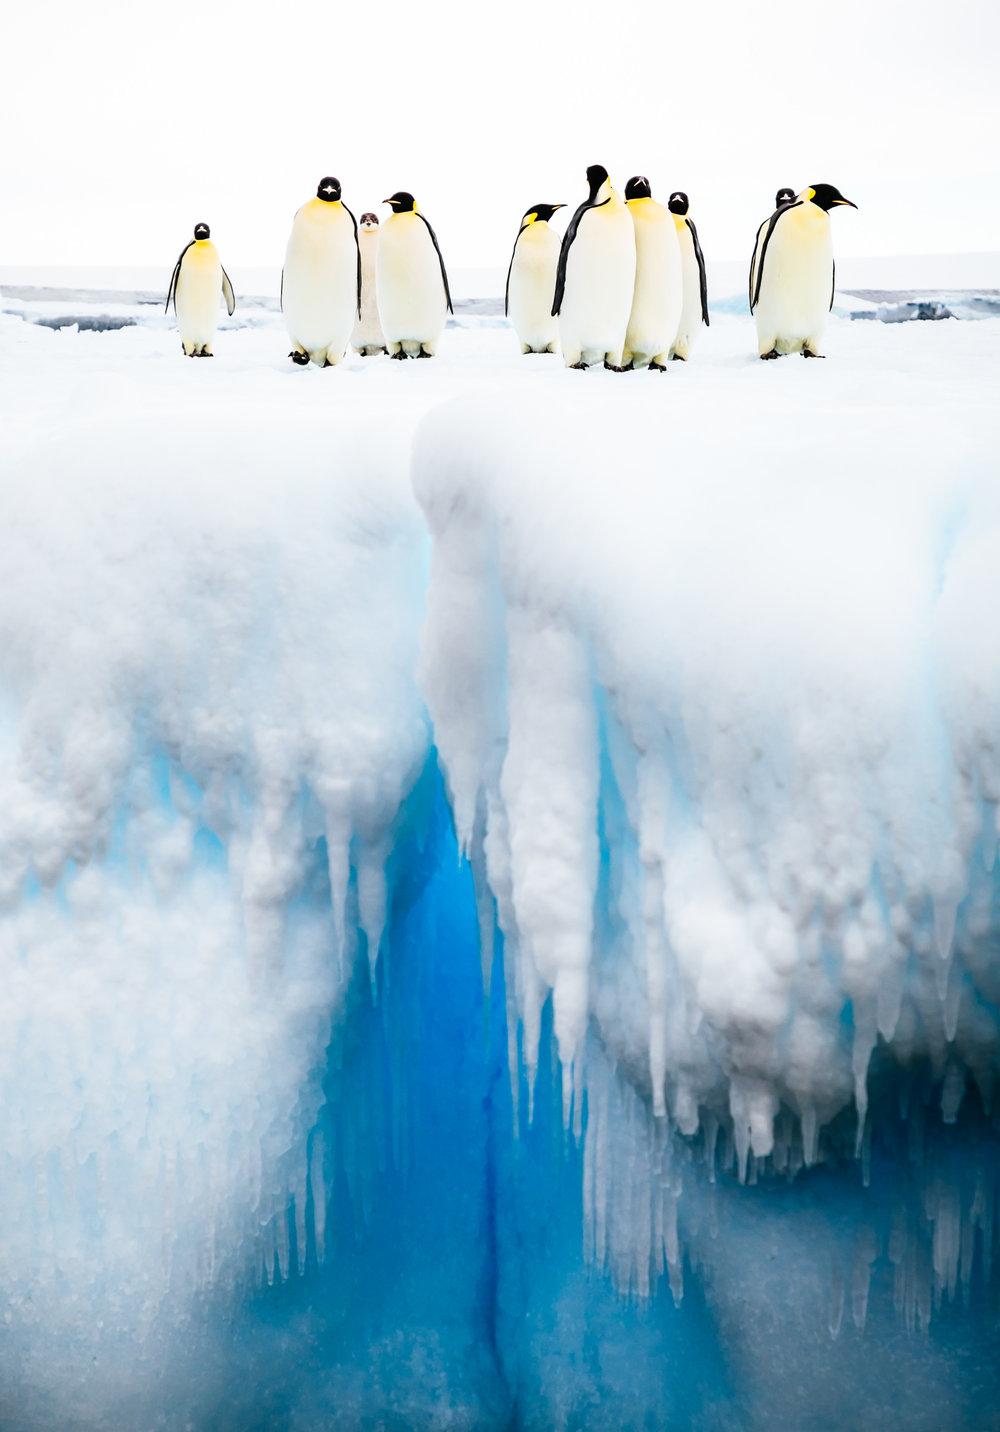 apeacock_antarctica_170128-44562.jpg